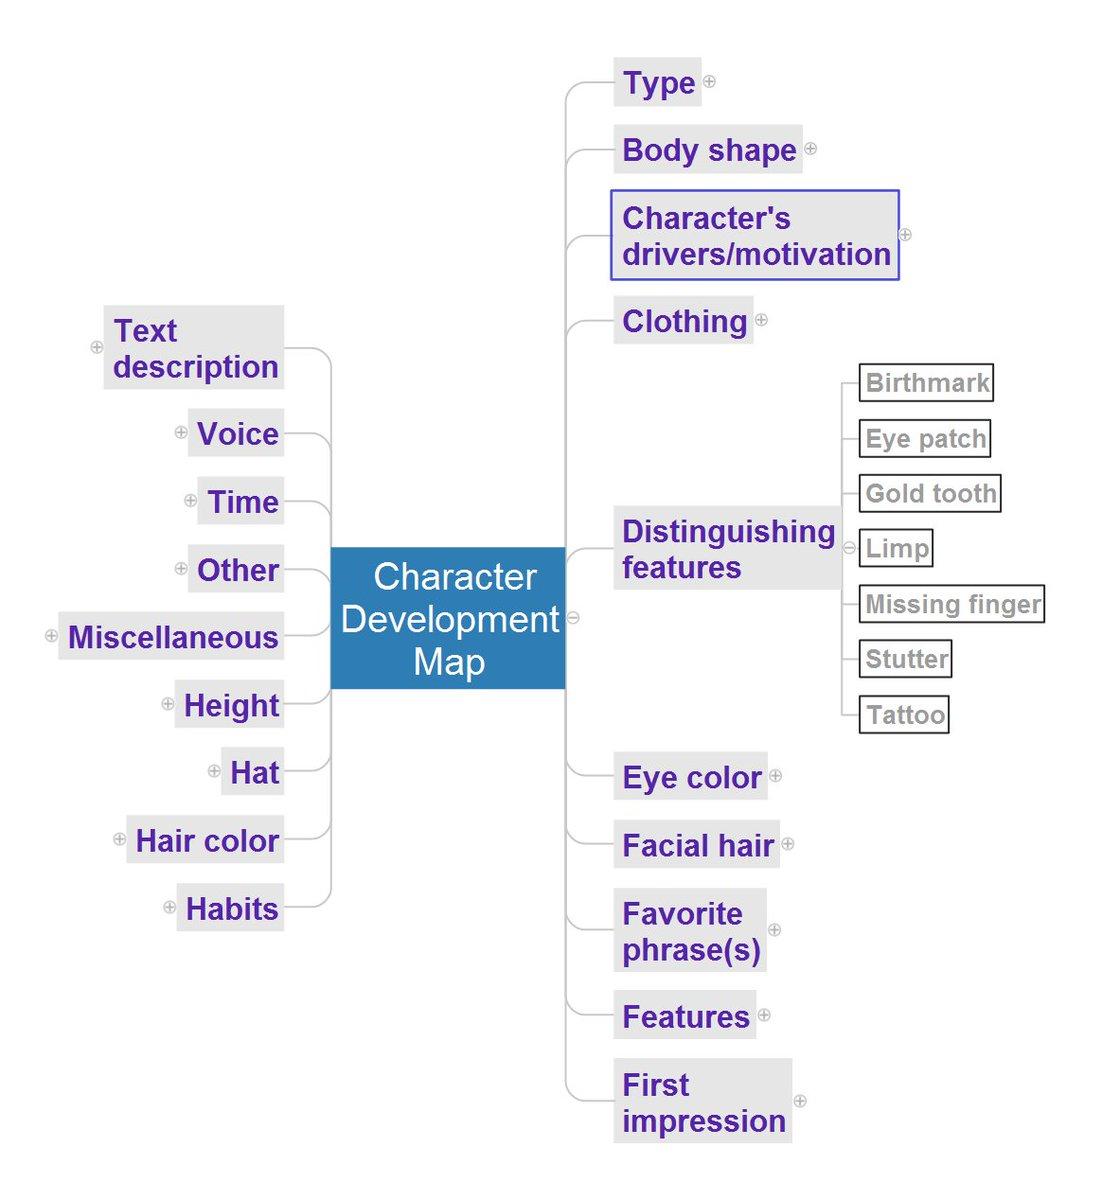 Character Development Brainstorm mindmap template  http:// bit.ly/2jL1OQA  &nbsp;     #Writers #ConceptDraw  http://www. conceptdraw.com  &nbsp;  <br>http://pic.twitter.com/JRX0uHGccR